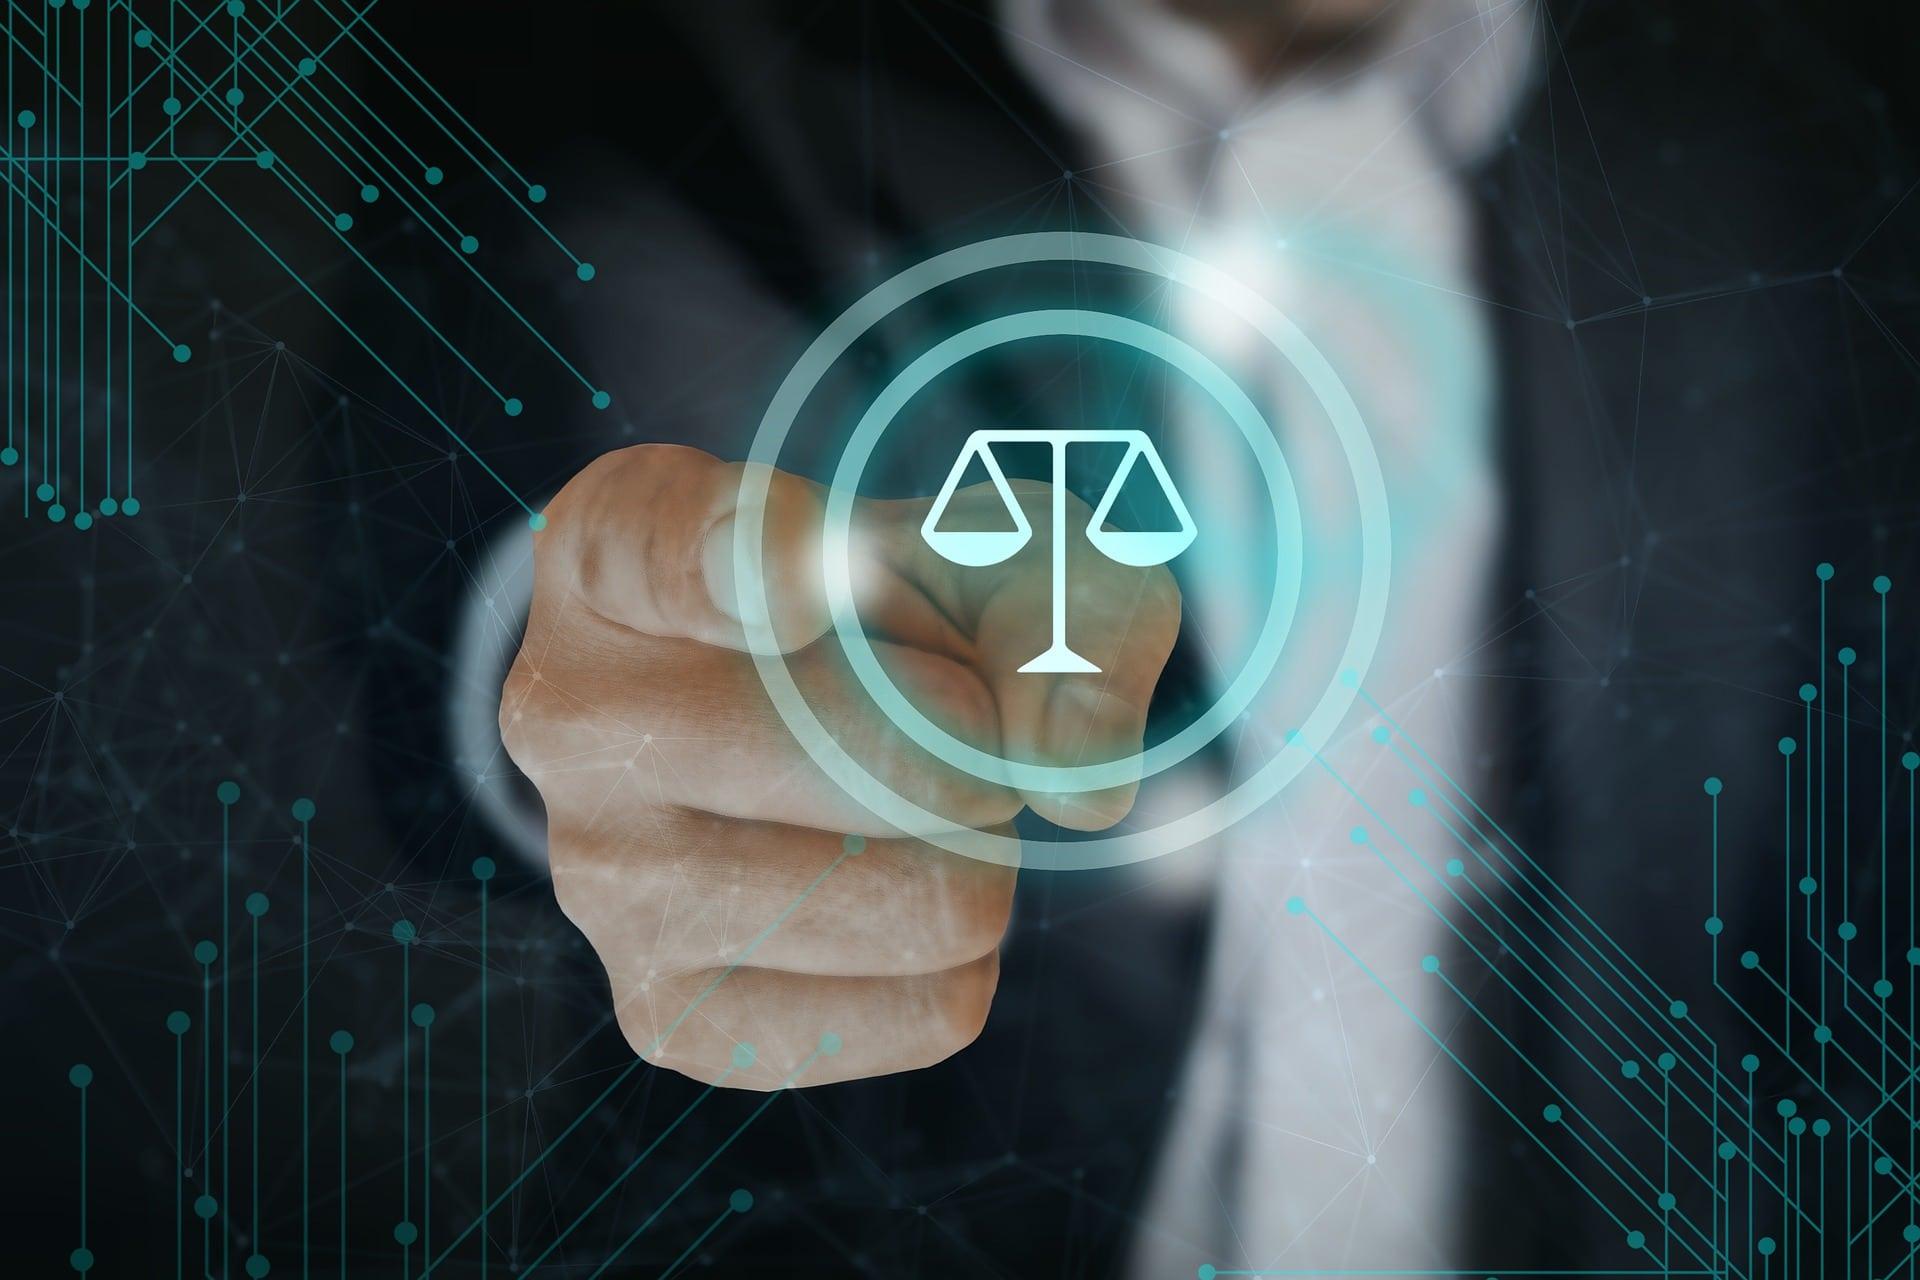 La SEC mette sotto inchiesta l'exchange UniSwap